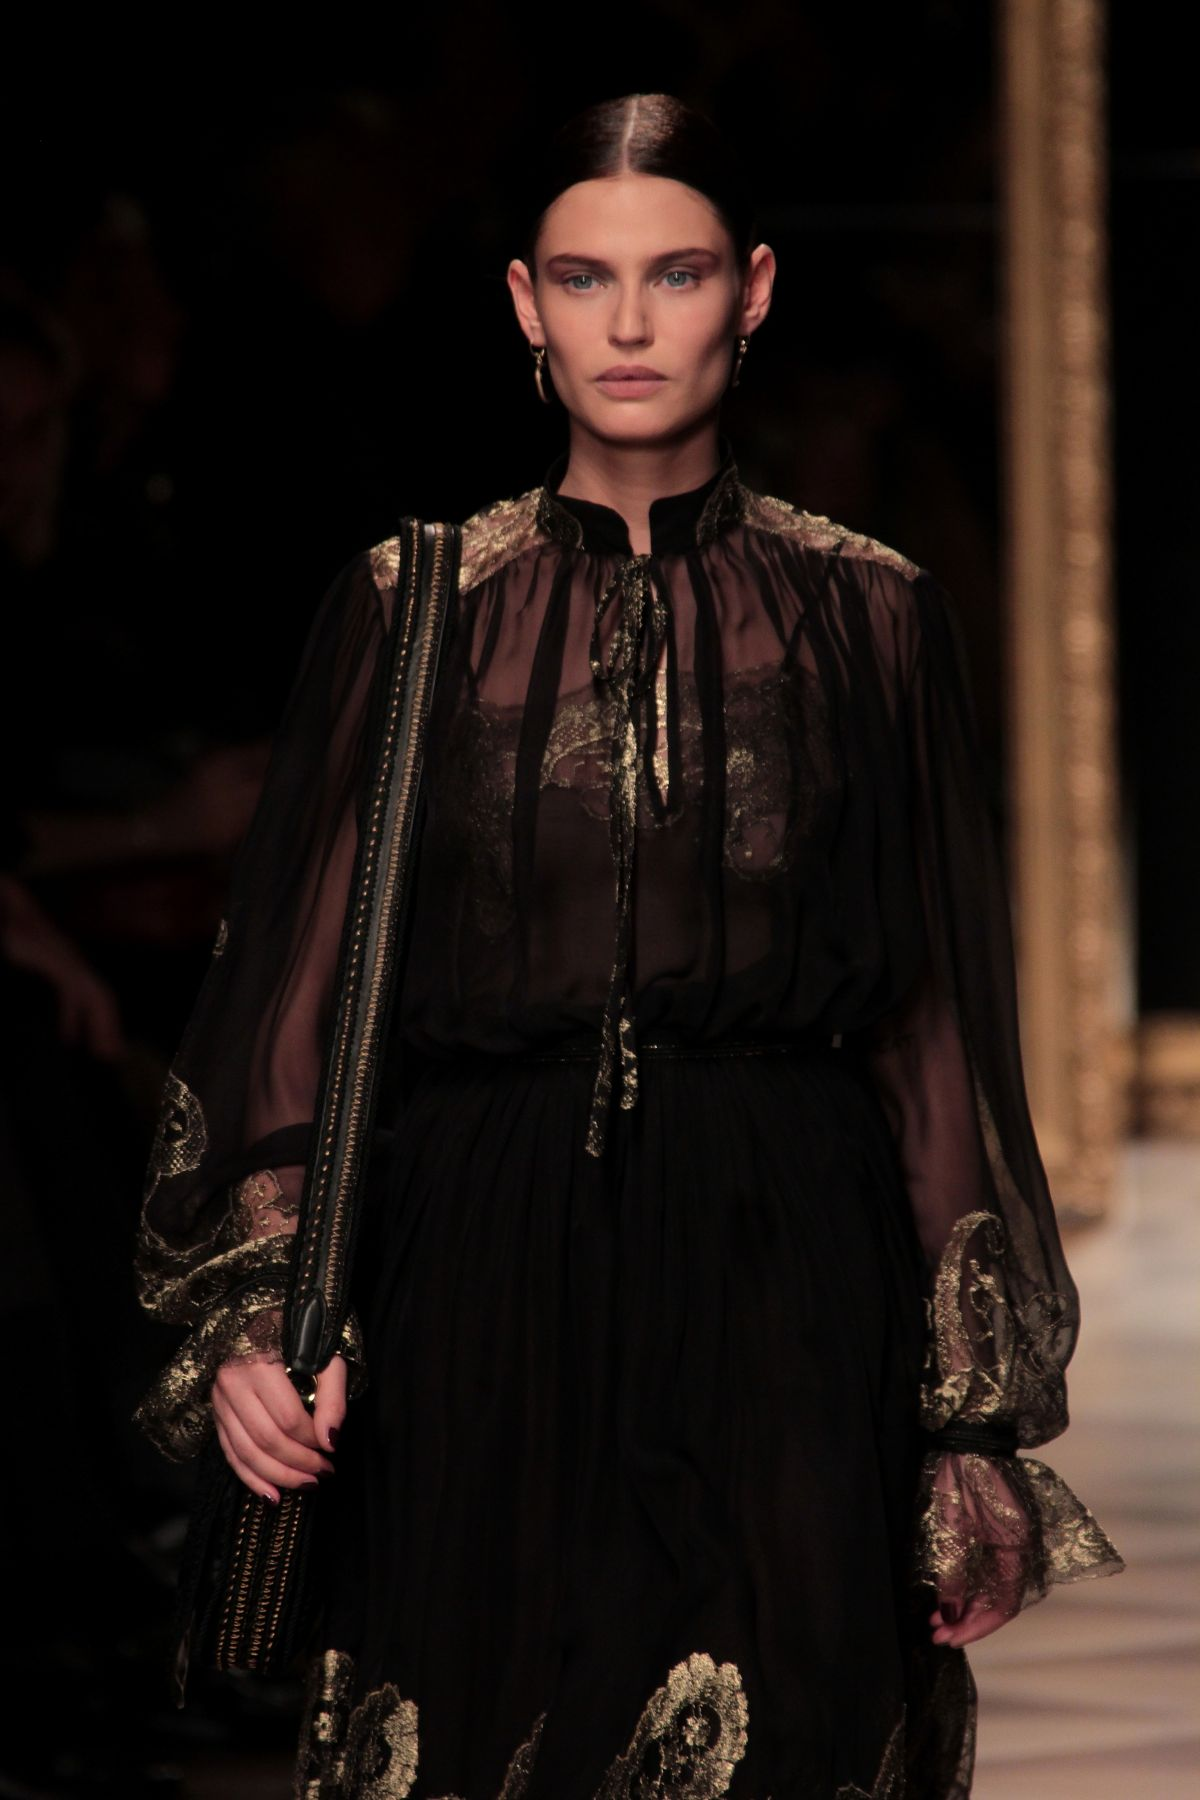 Milan Fashion Week 2012 Salvatore Ferragamo Woman